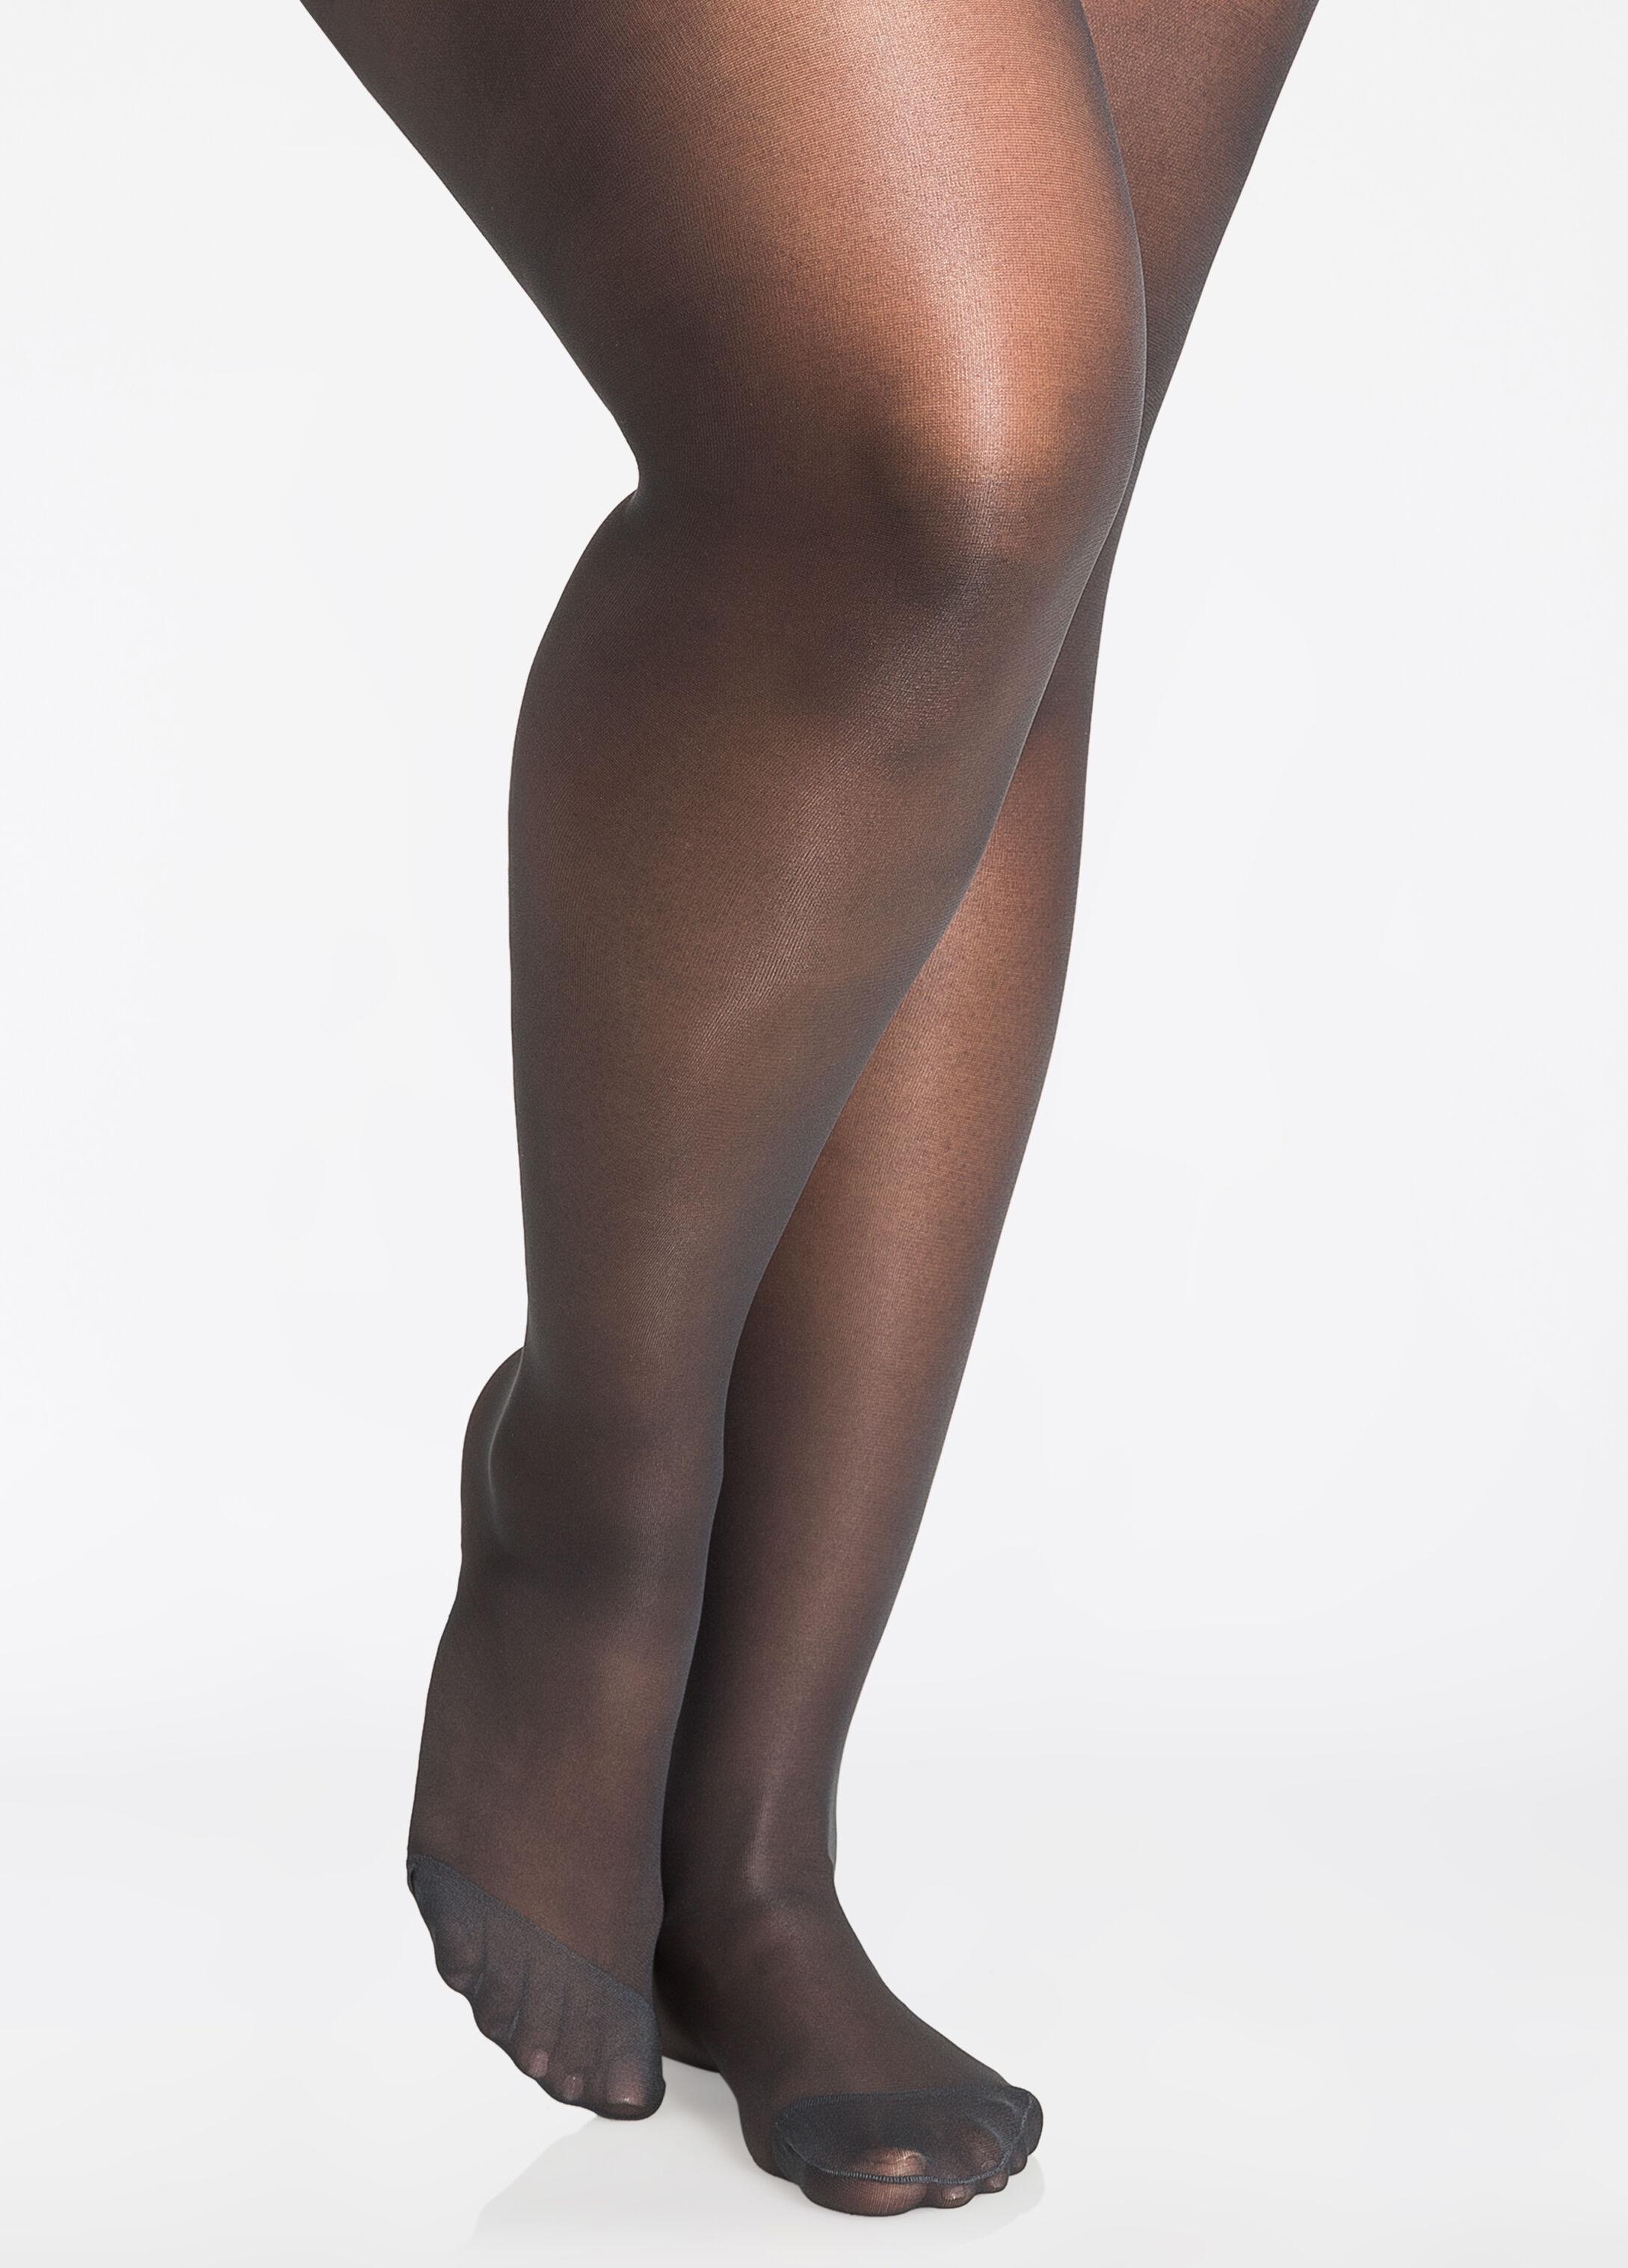 plus size pantyhose - berkshire queen silky control top pantyhose